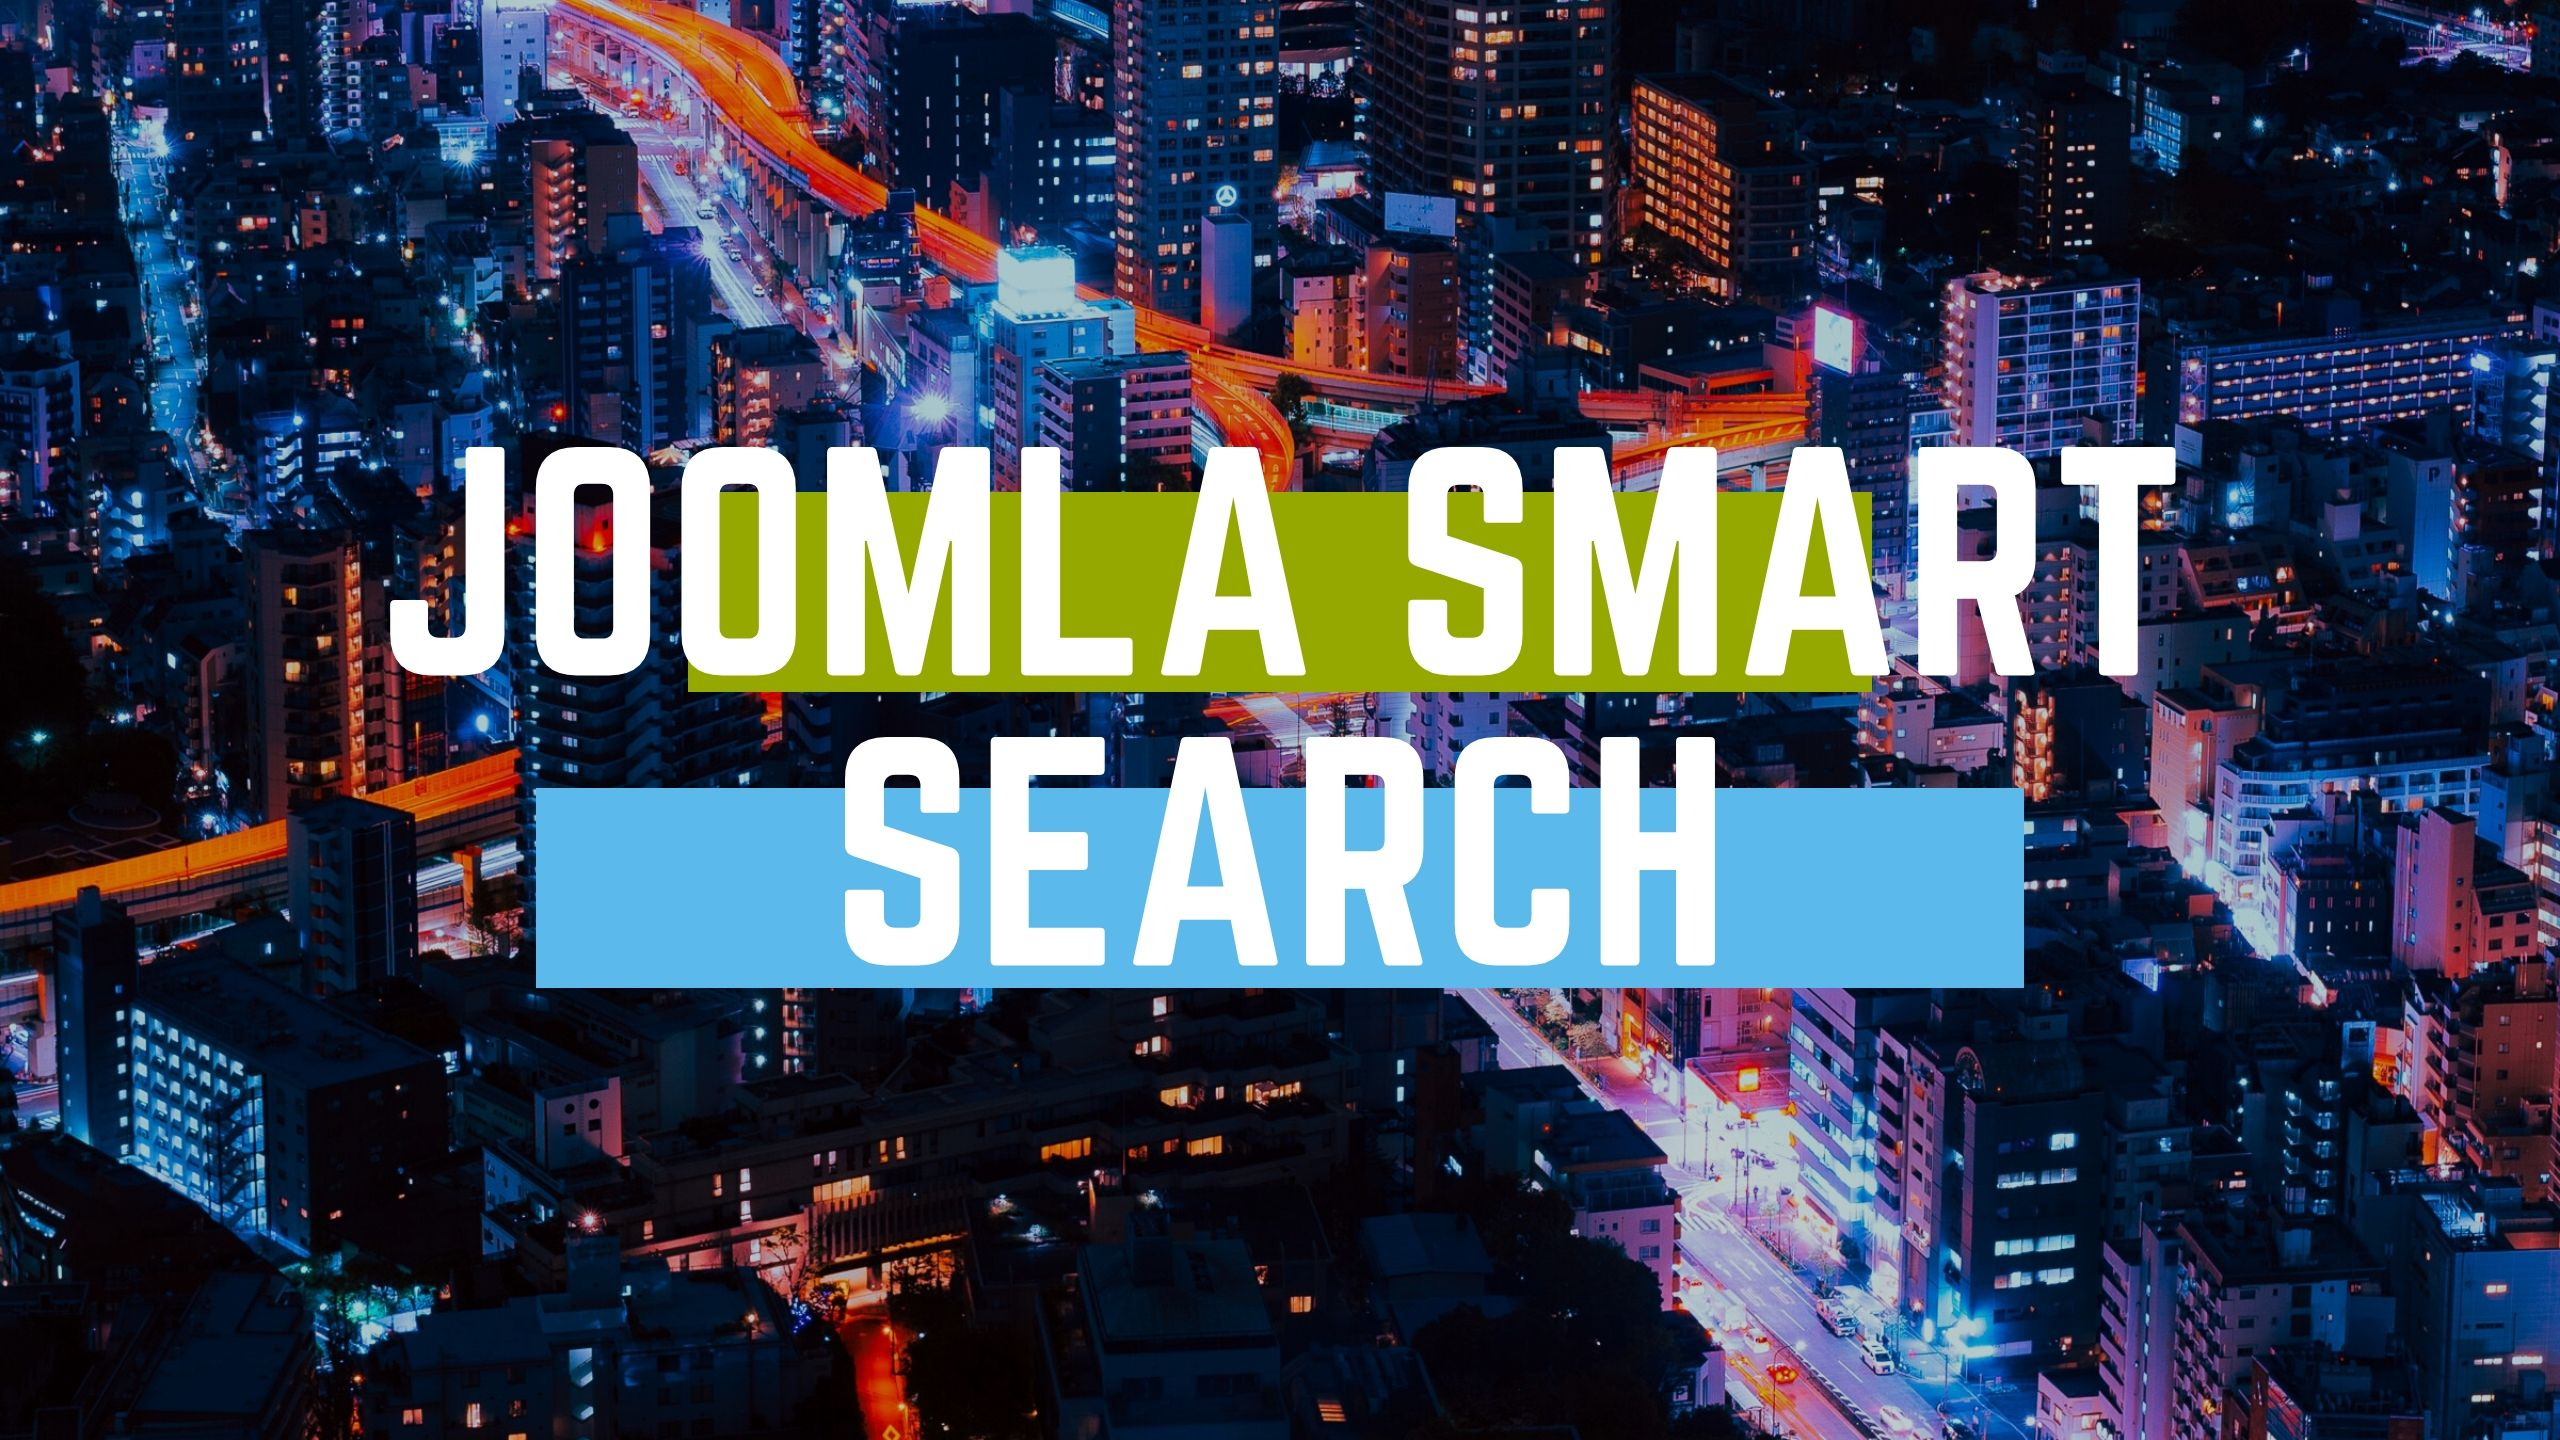 joomla smart search